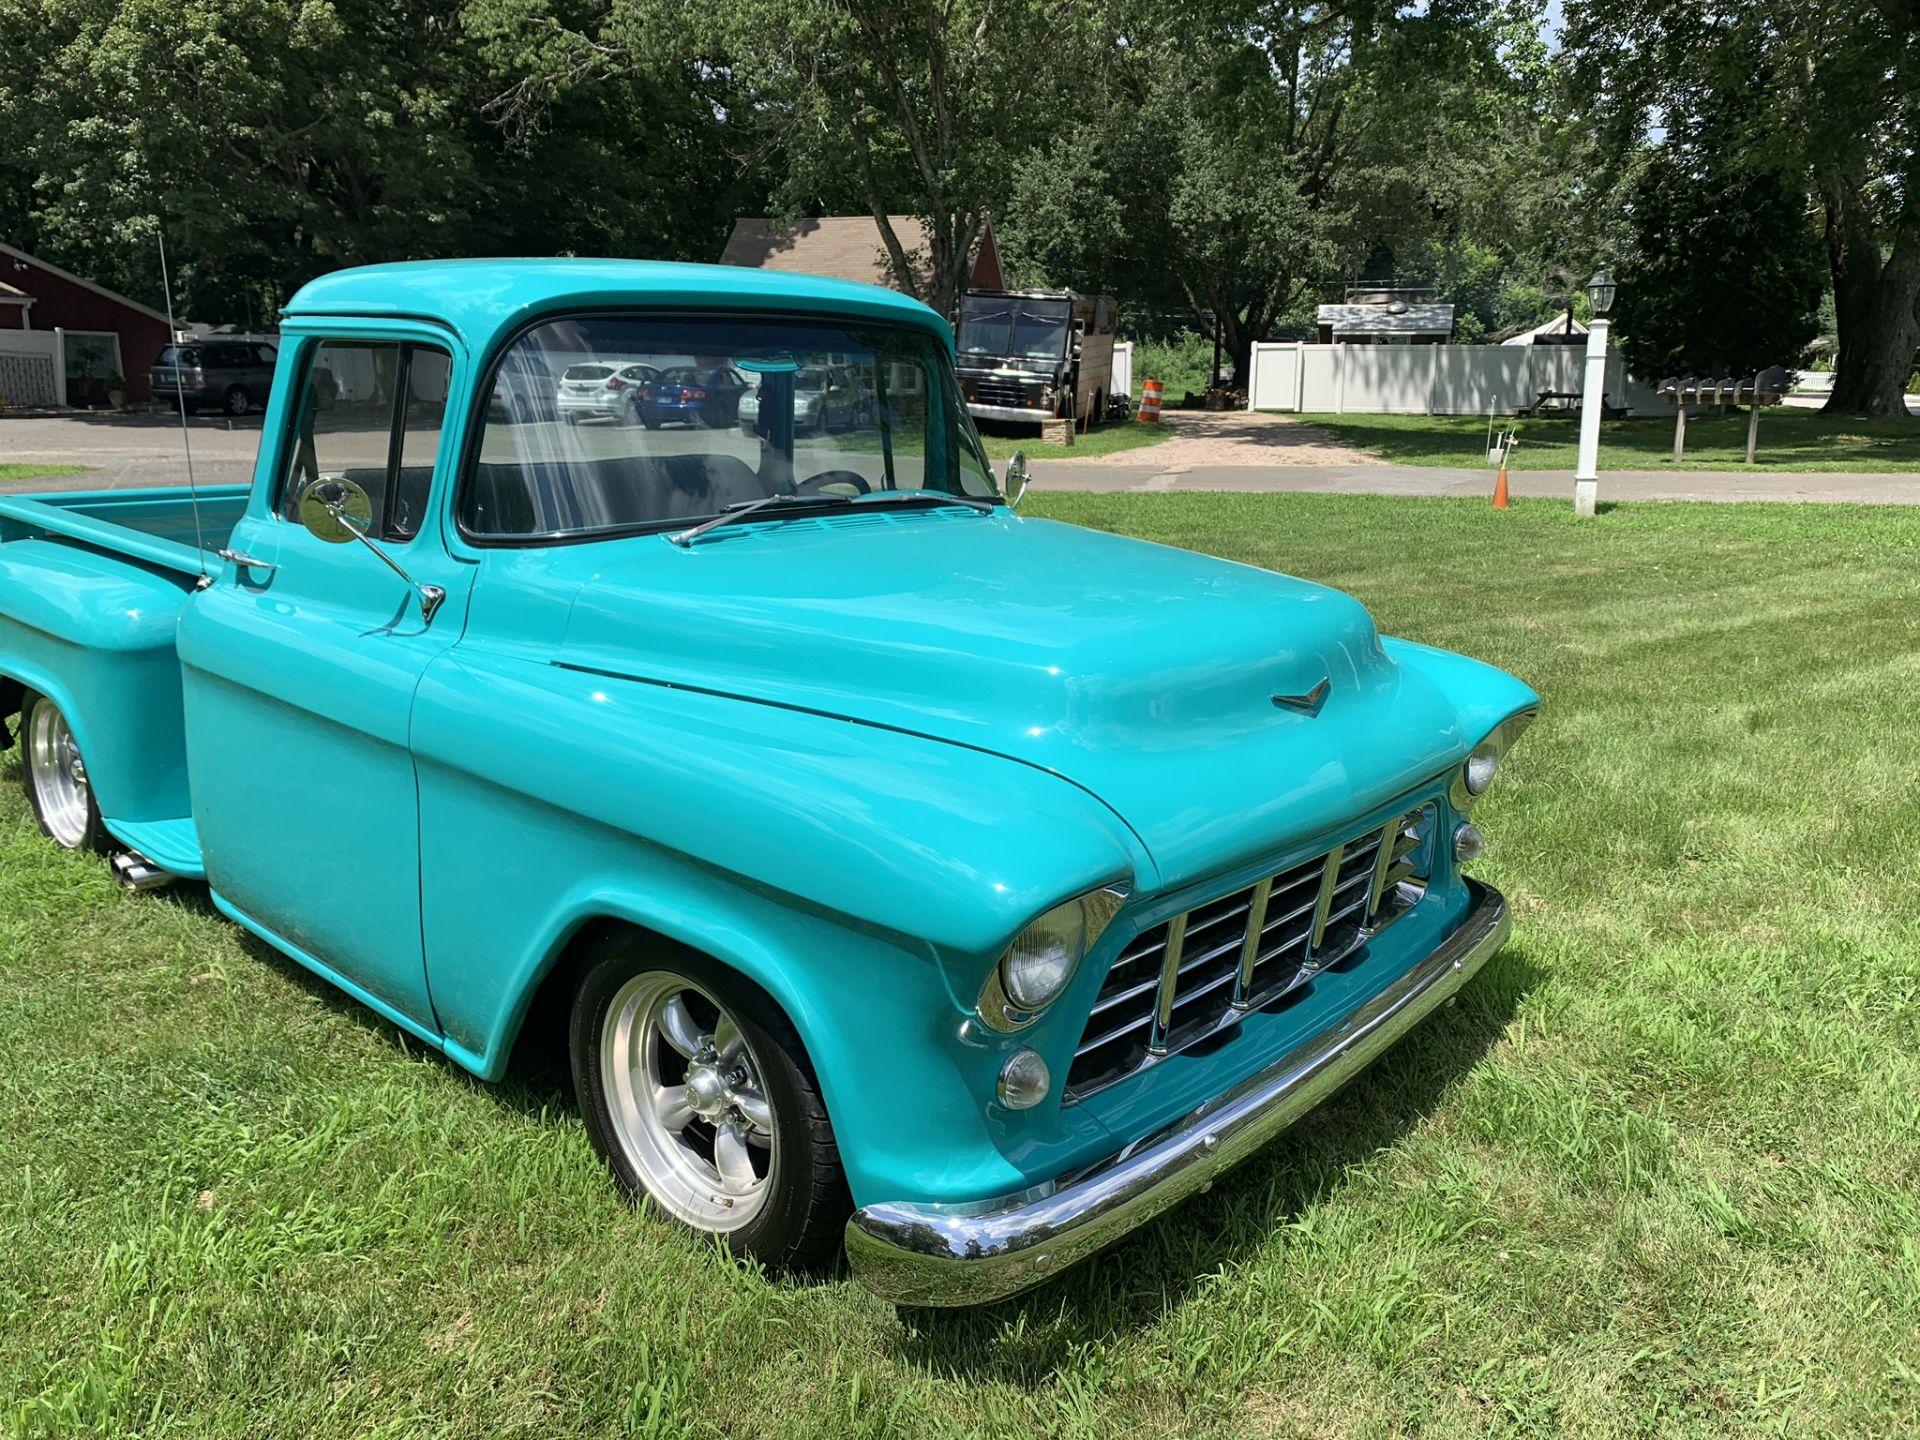 Lot 2 - 1955 Chevrolet 3100 Step Side Pickup Truck